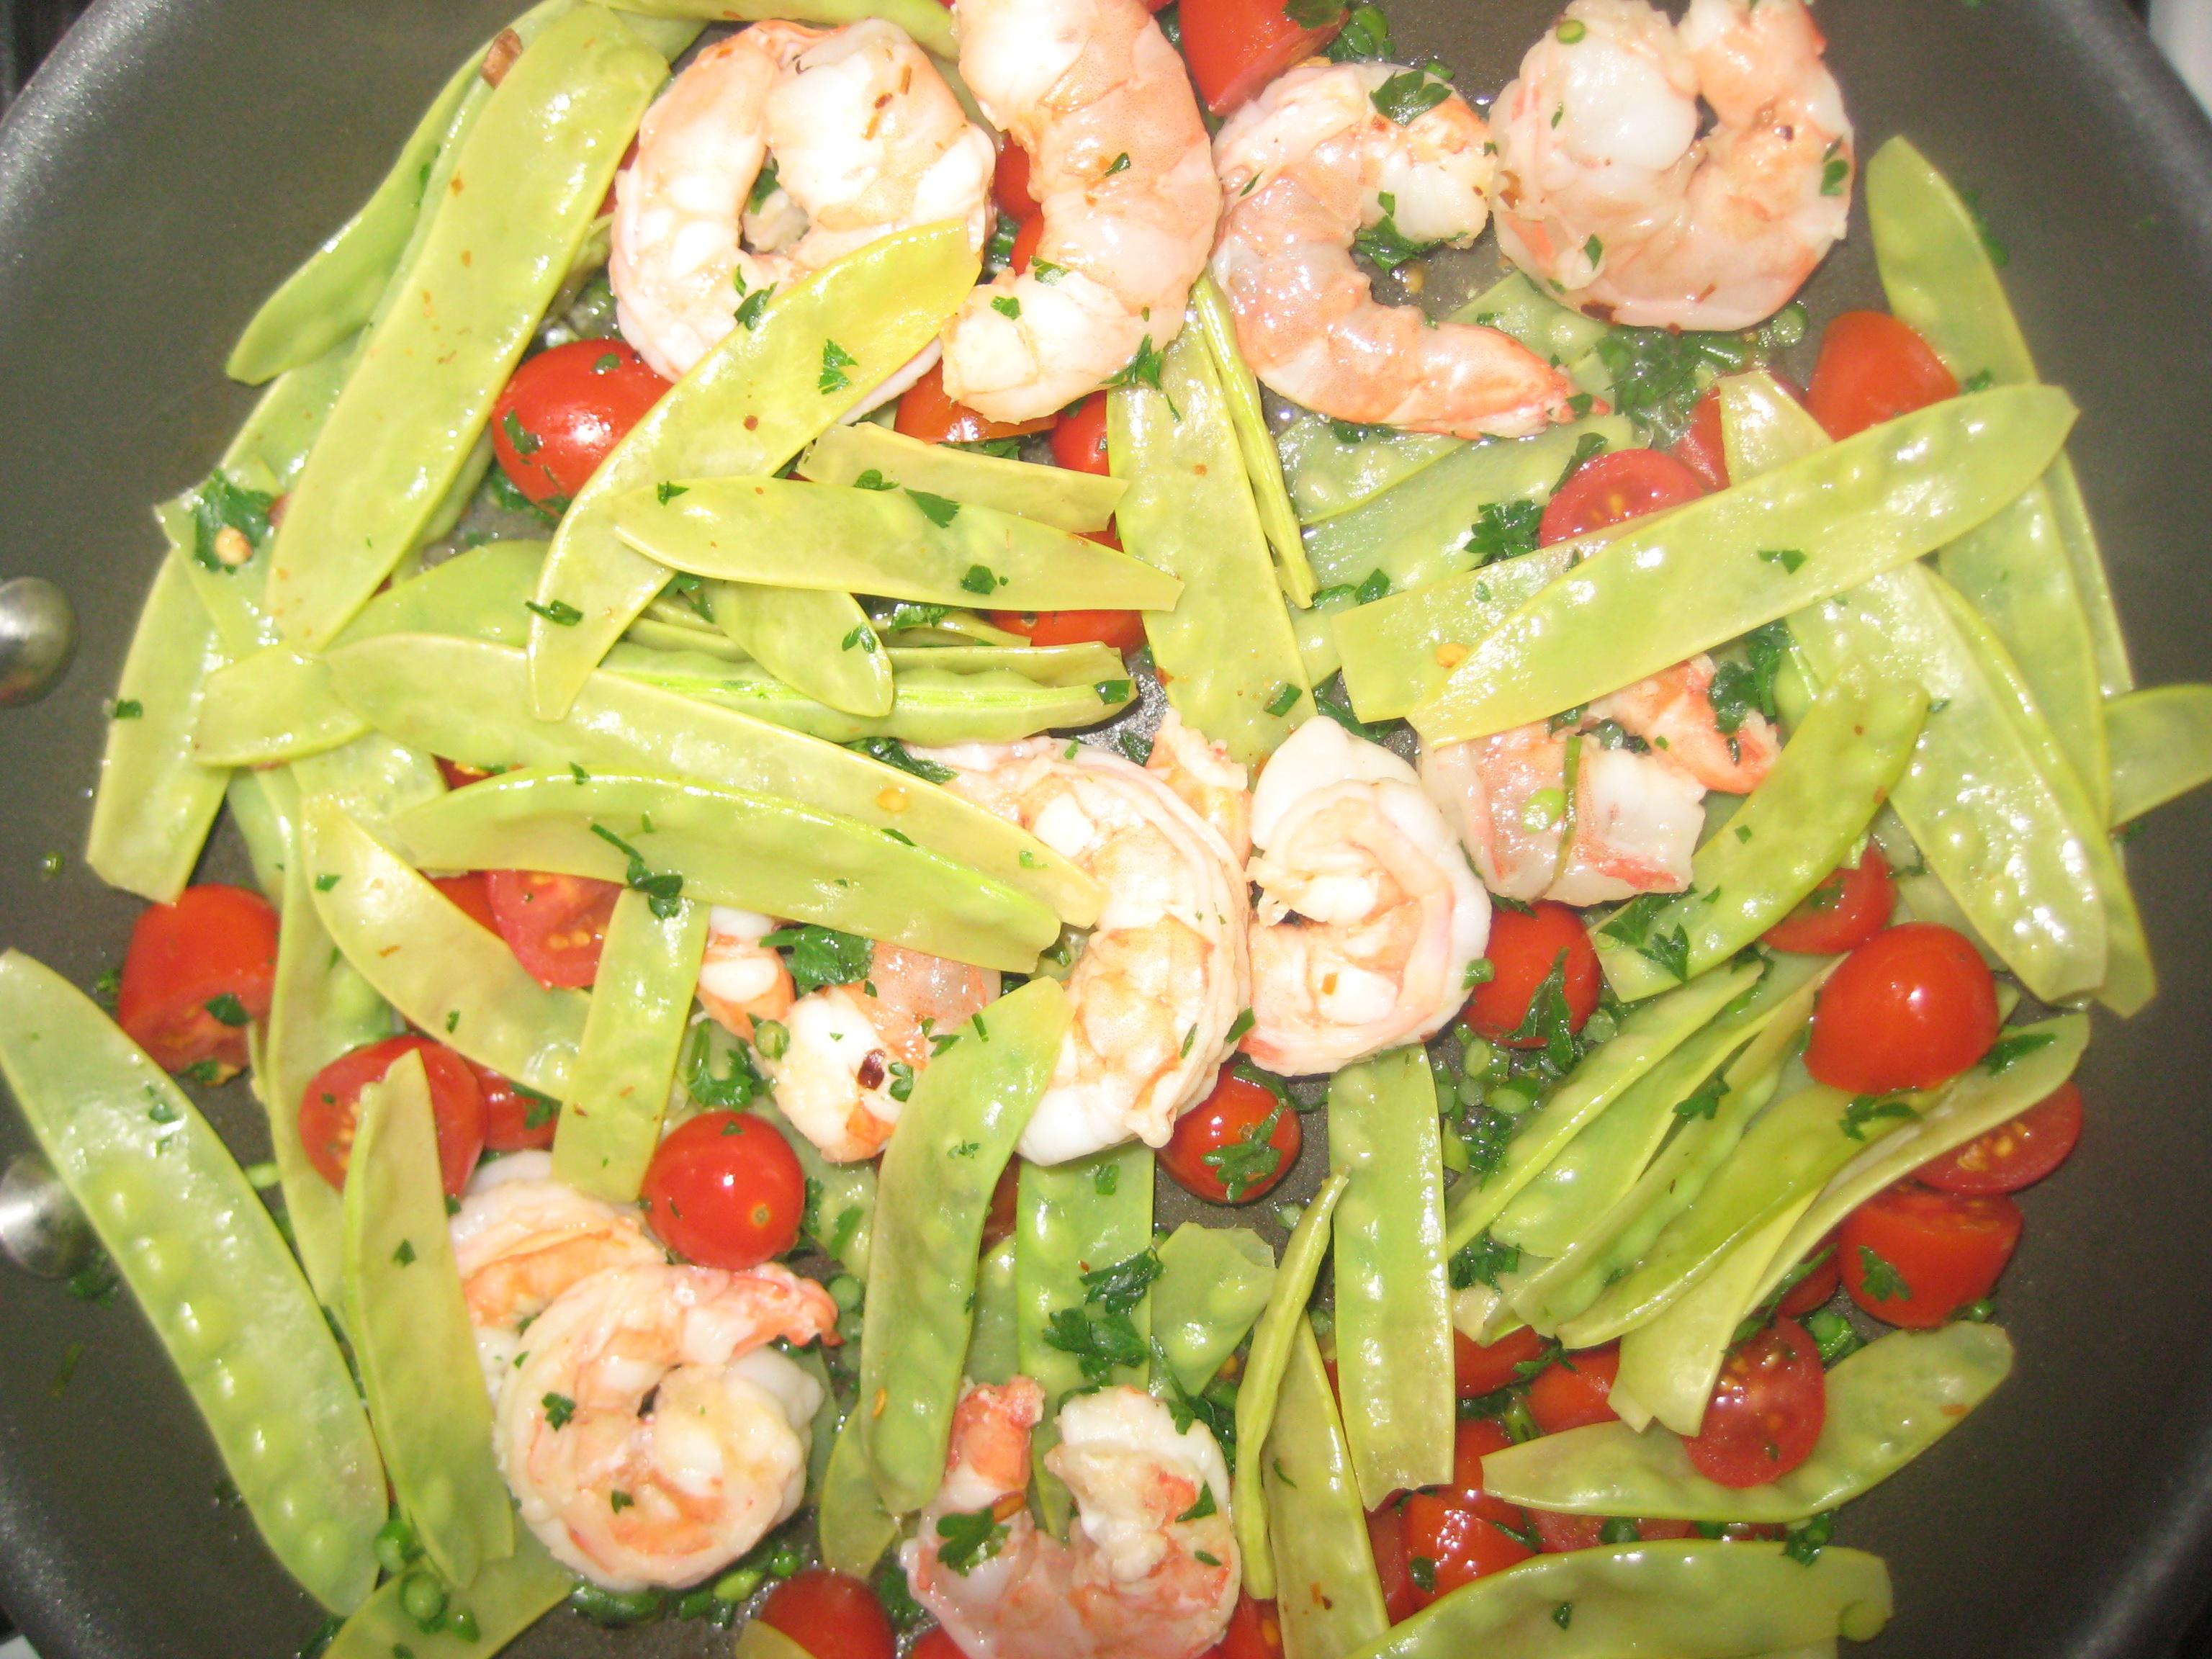 Shrimp and snow pea stir-fry | Nutripundit